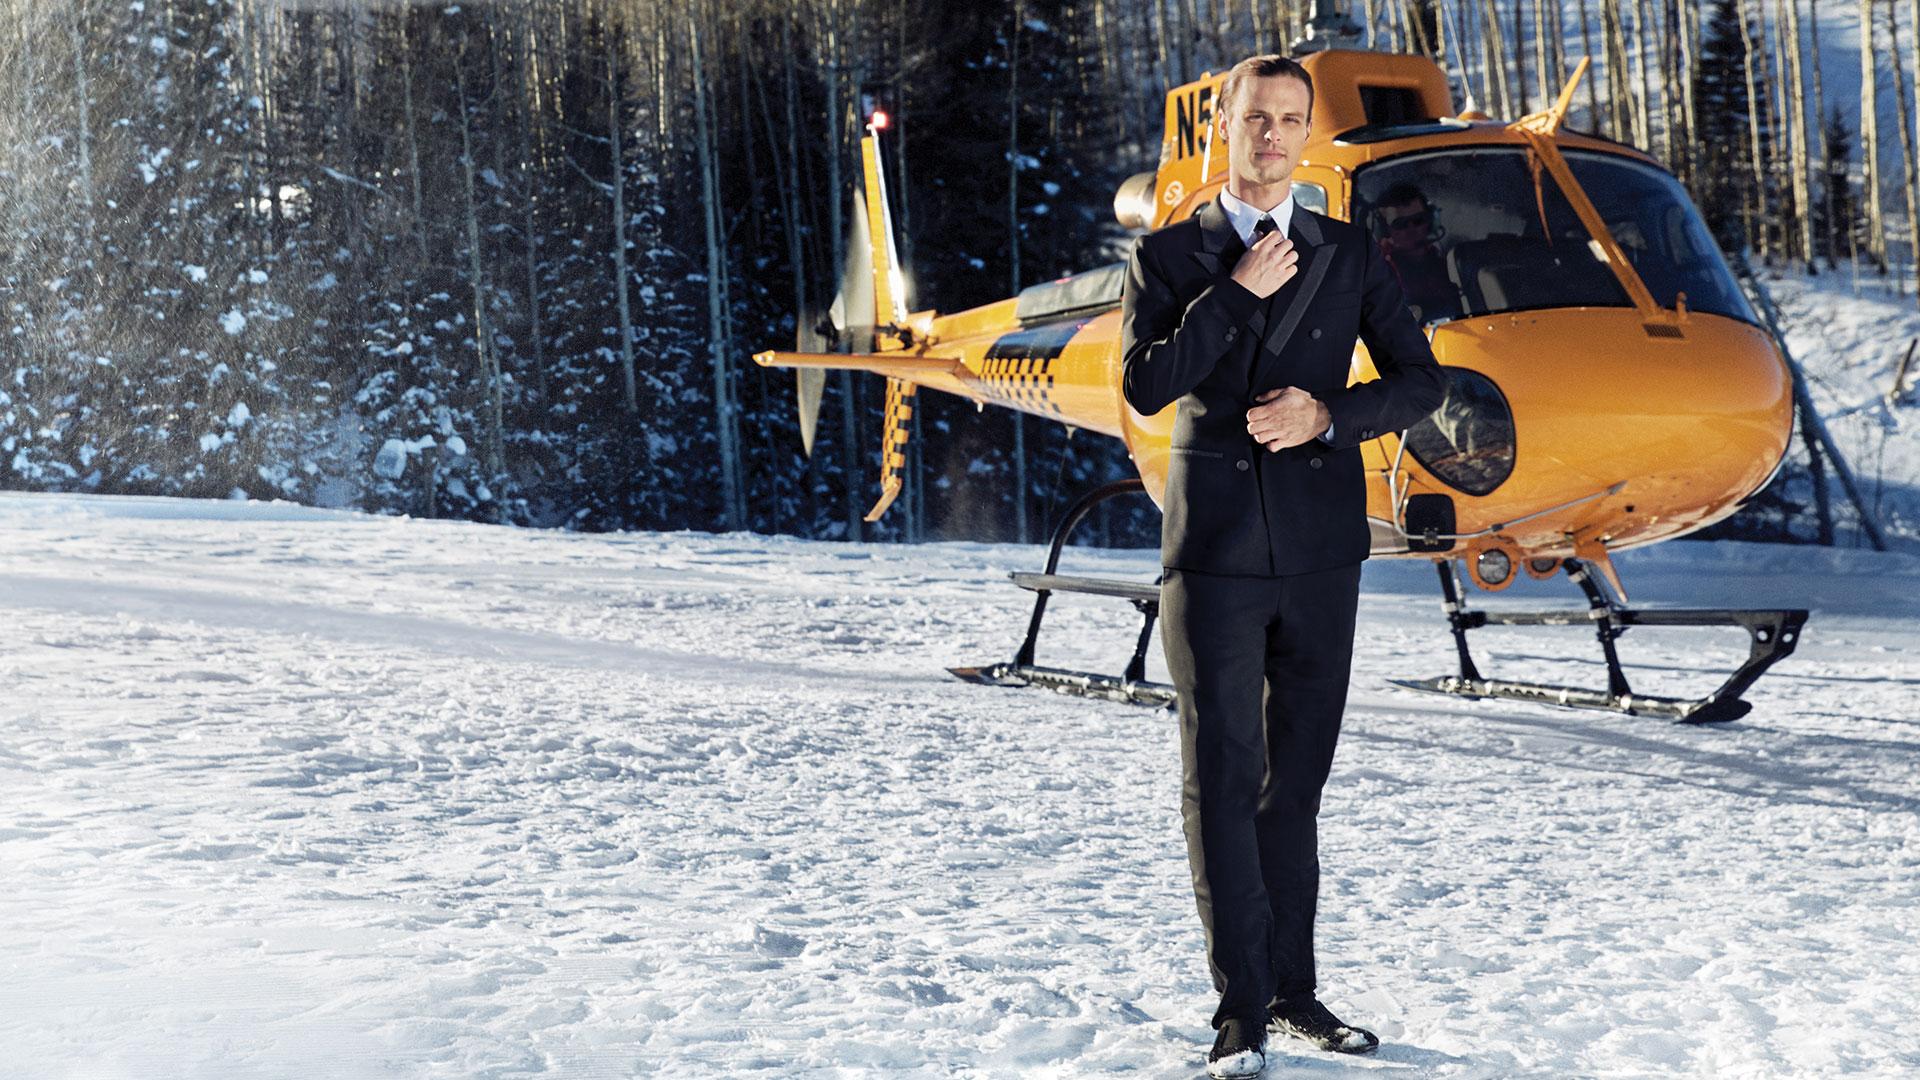 Matthew Gray Gubler as a dashing spy